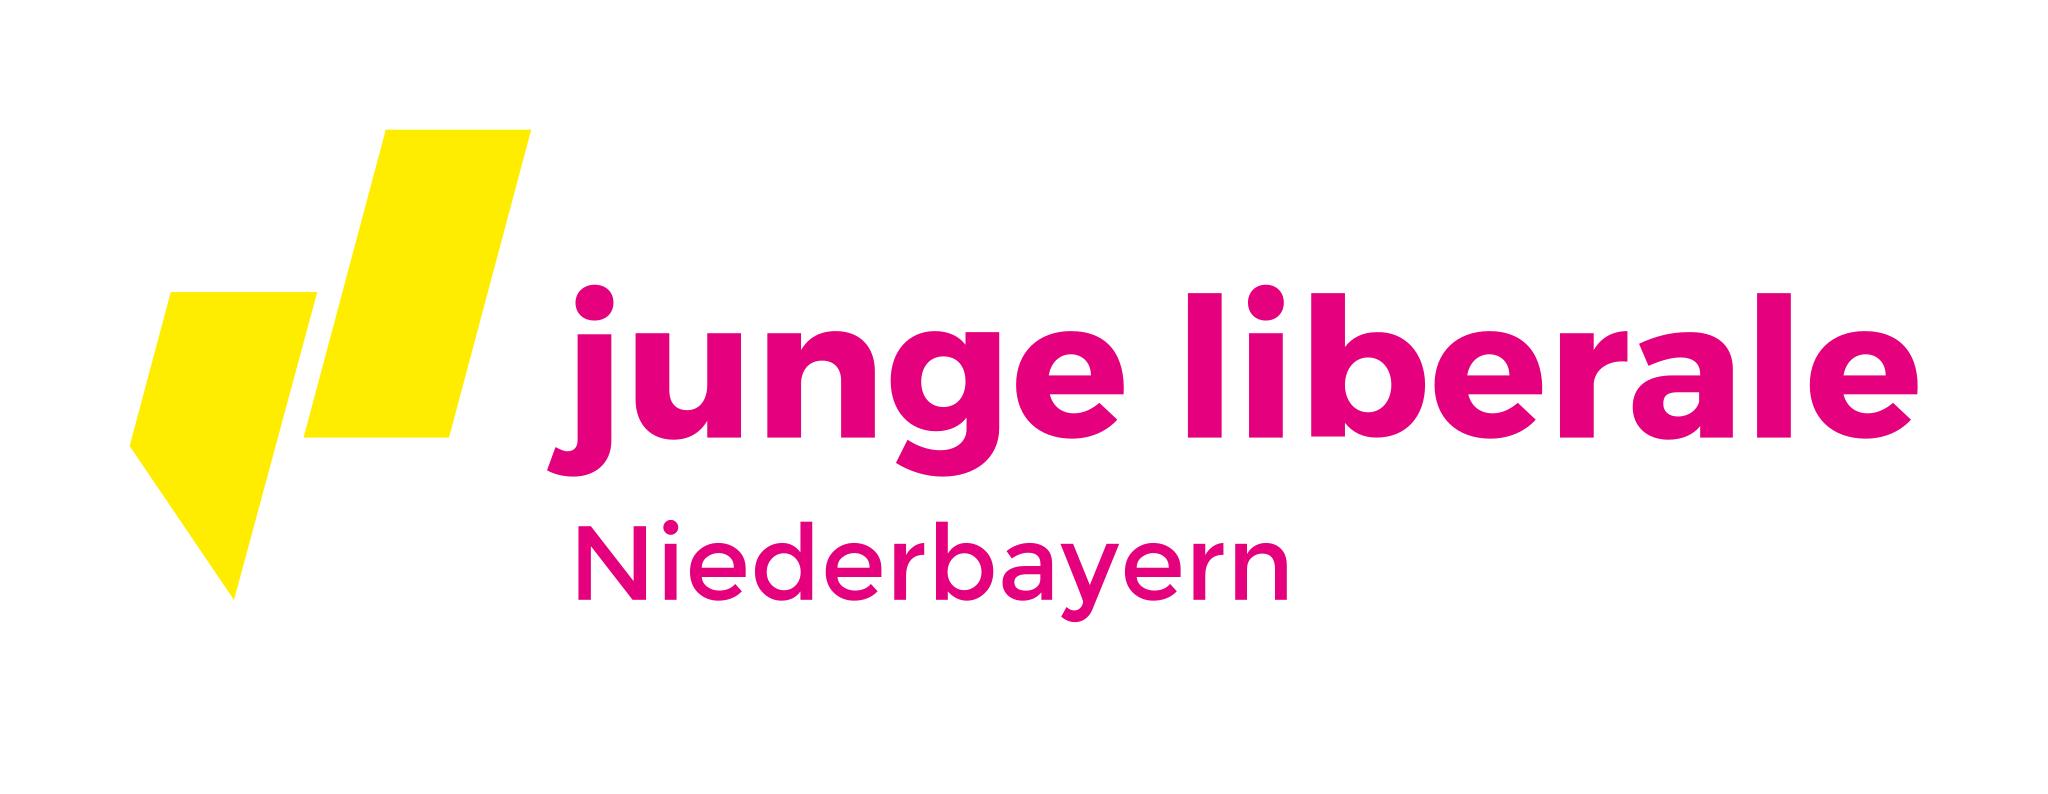 Junge Liberale Niederbayern